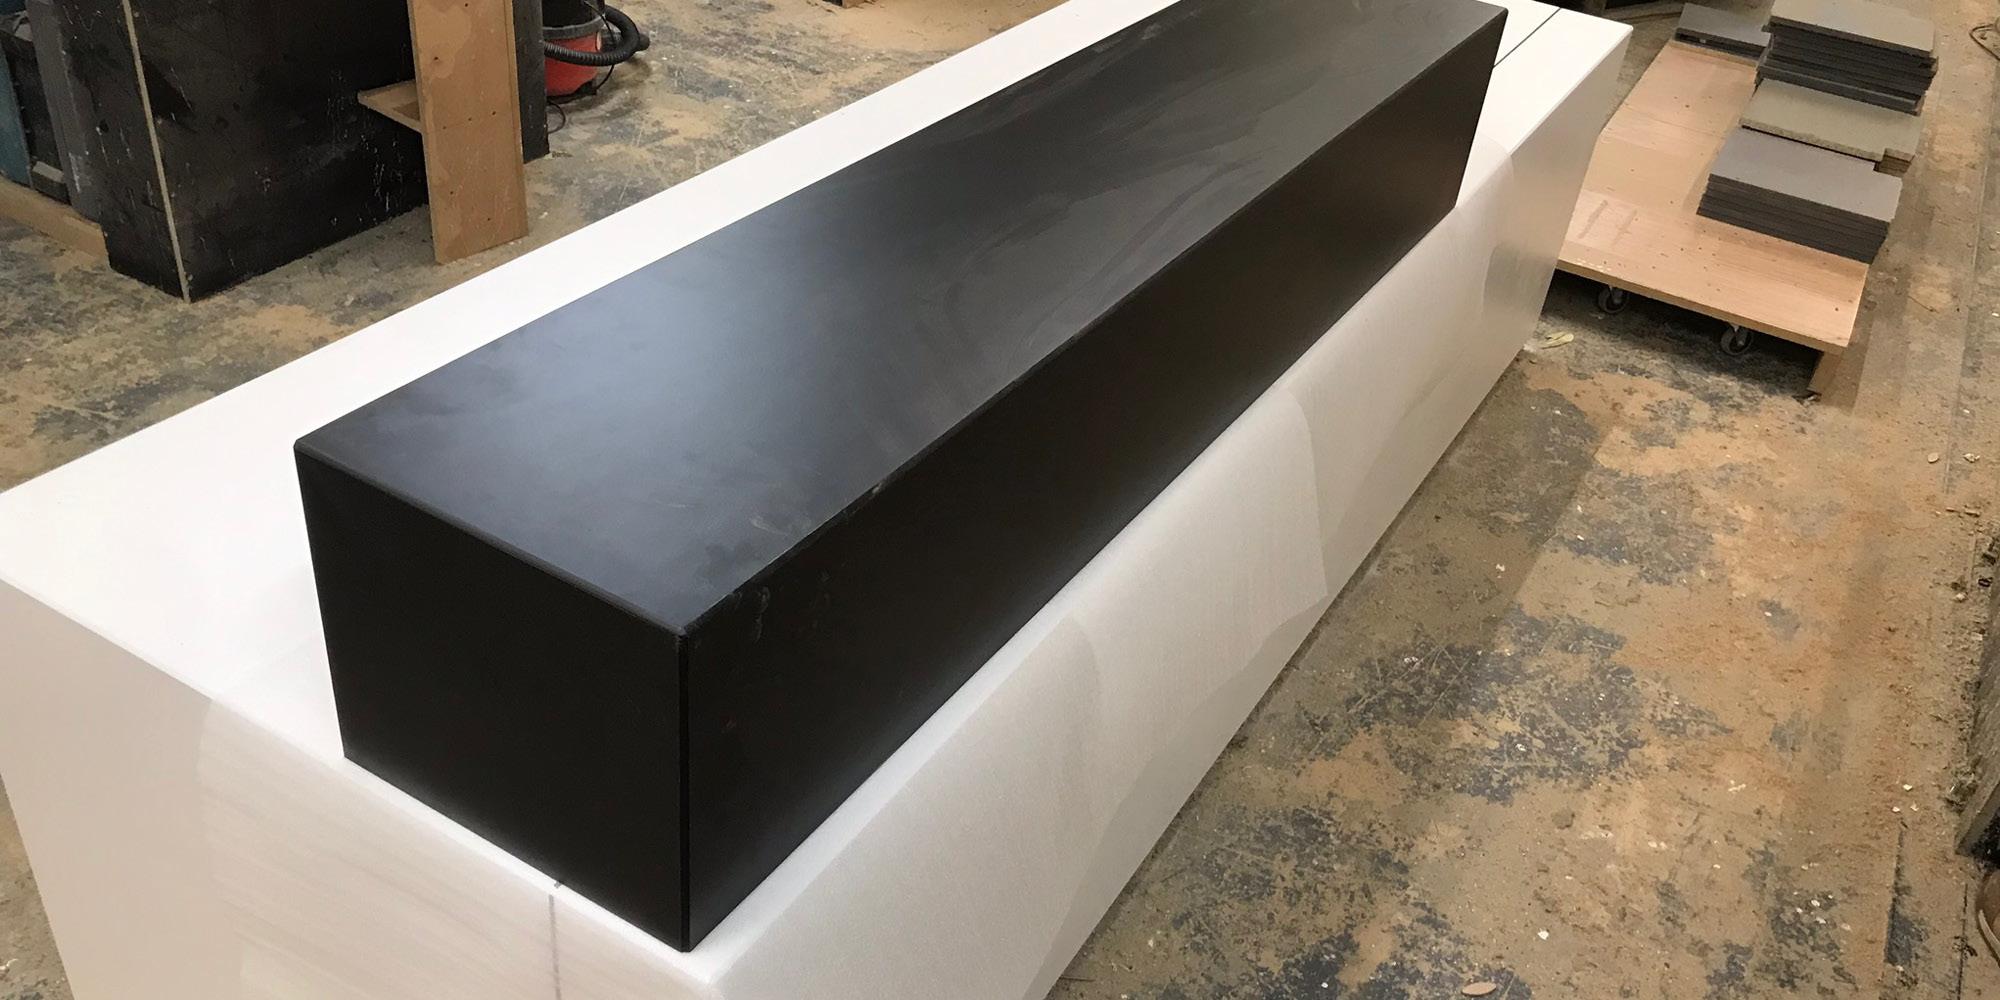 Set-Square-Gallery-15